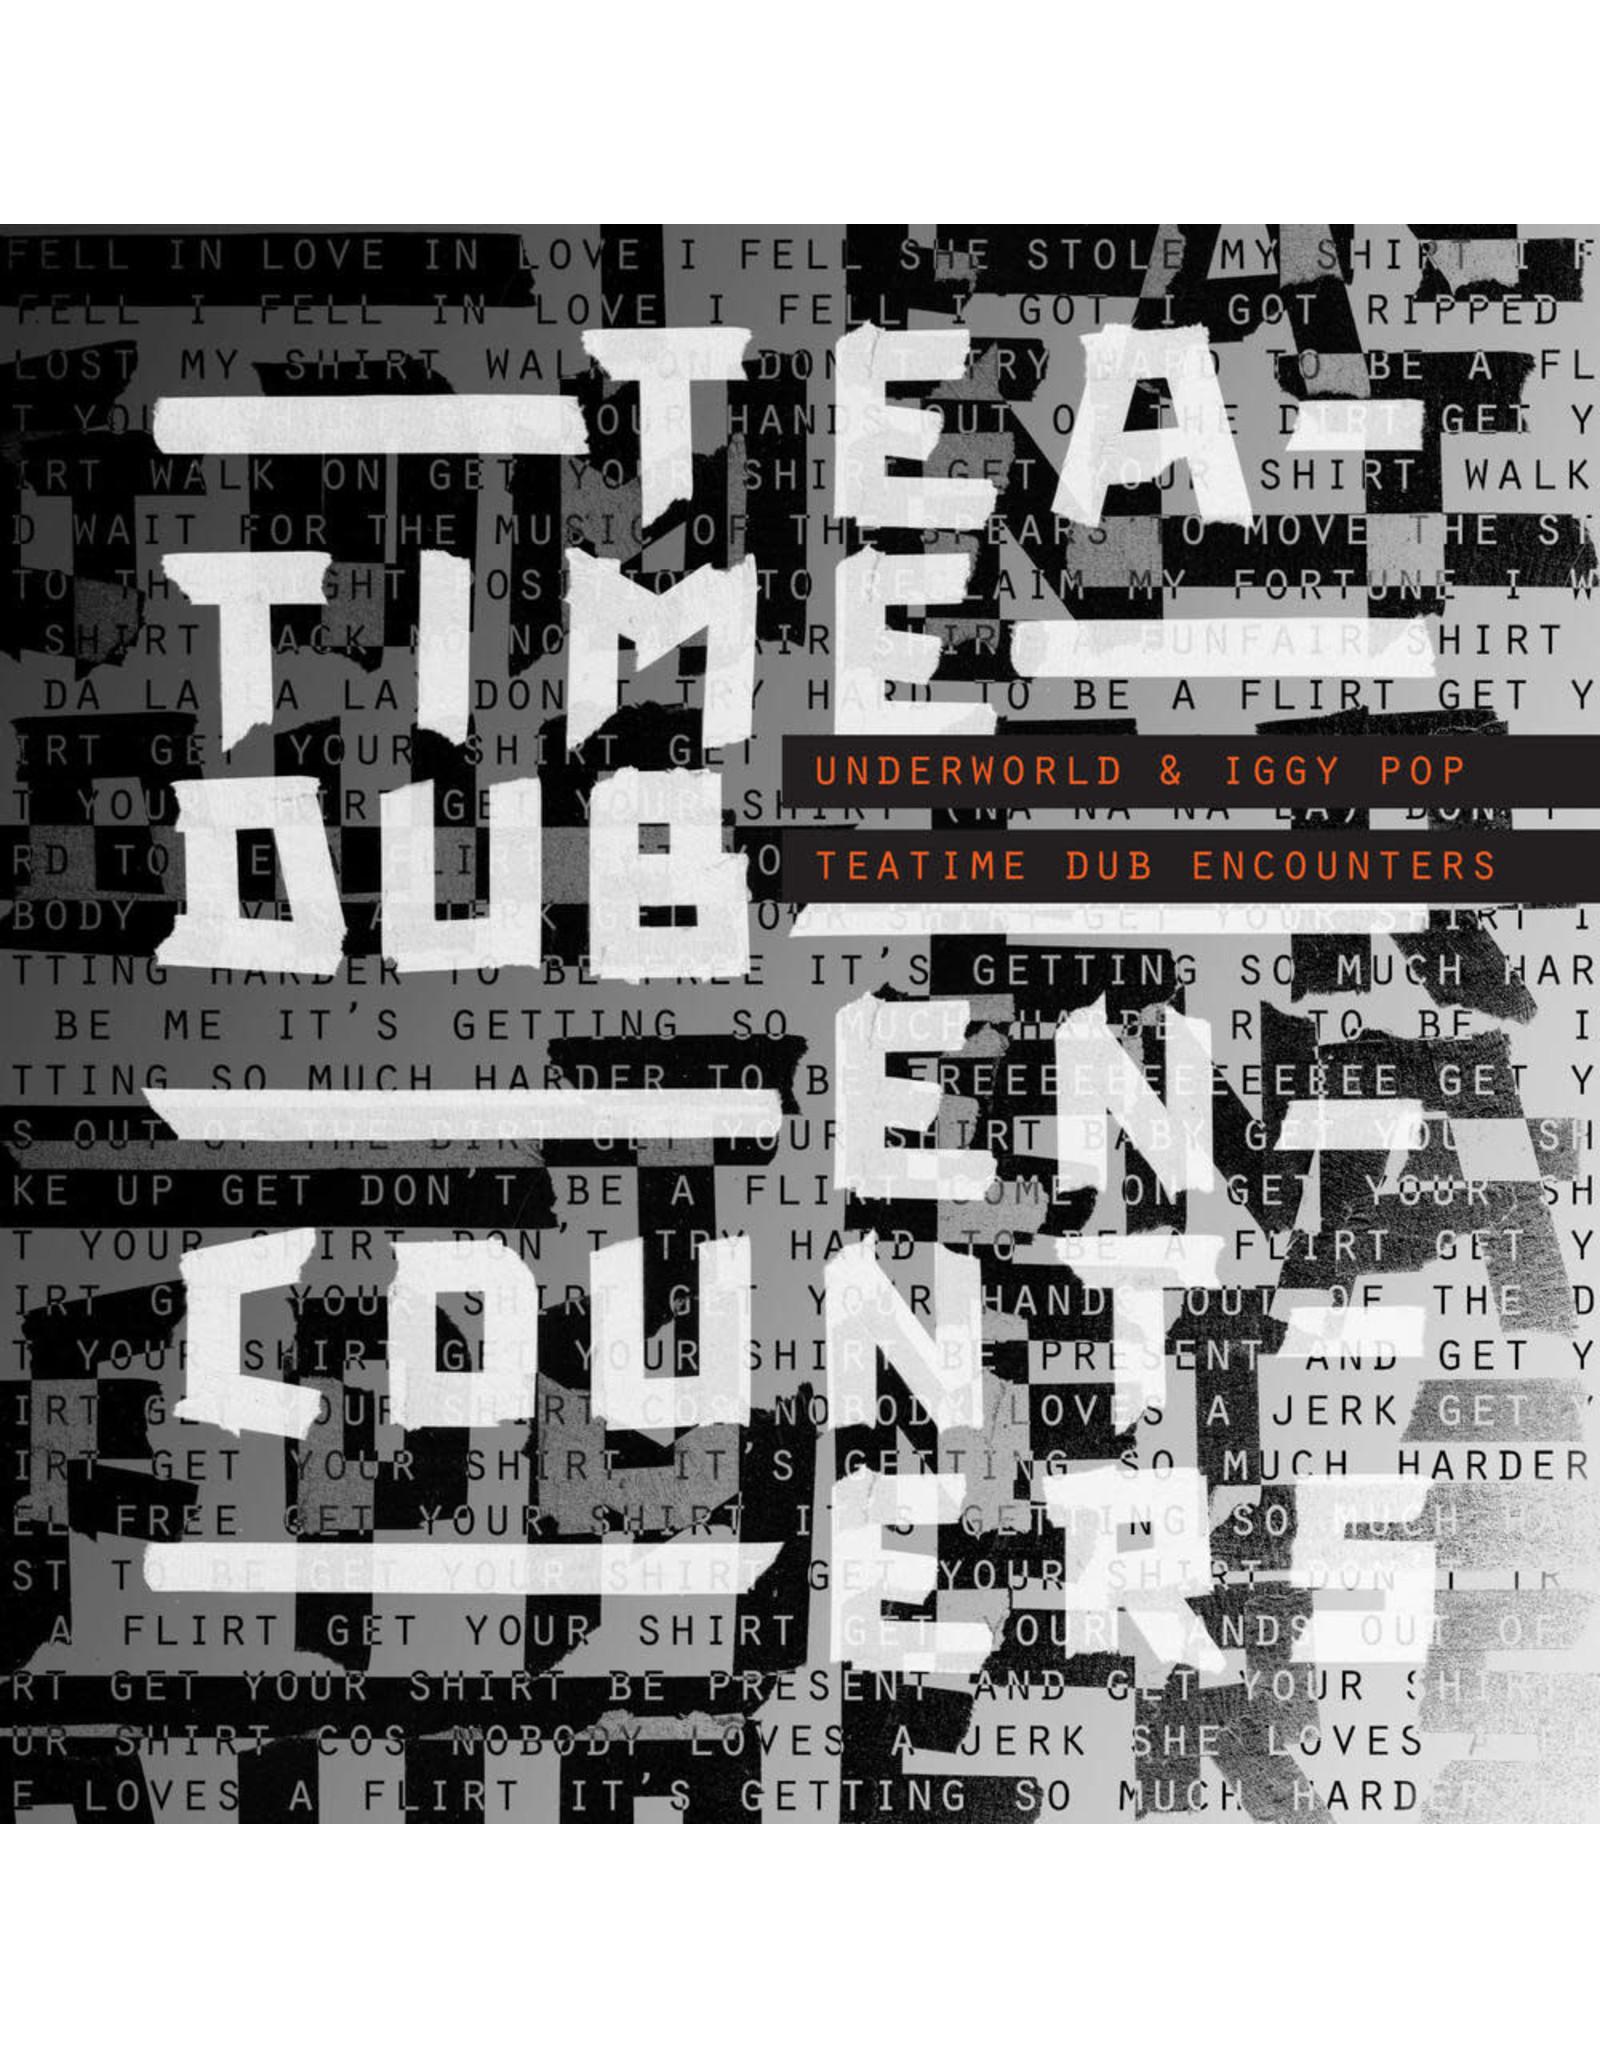 Pop, Iggy and Underworld - Teatime Dub Encounters LP